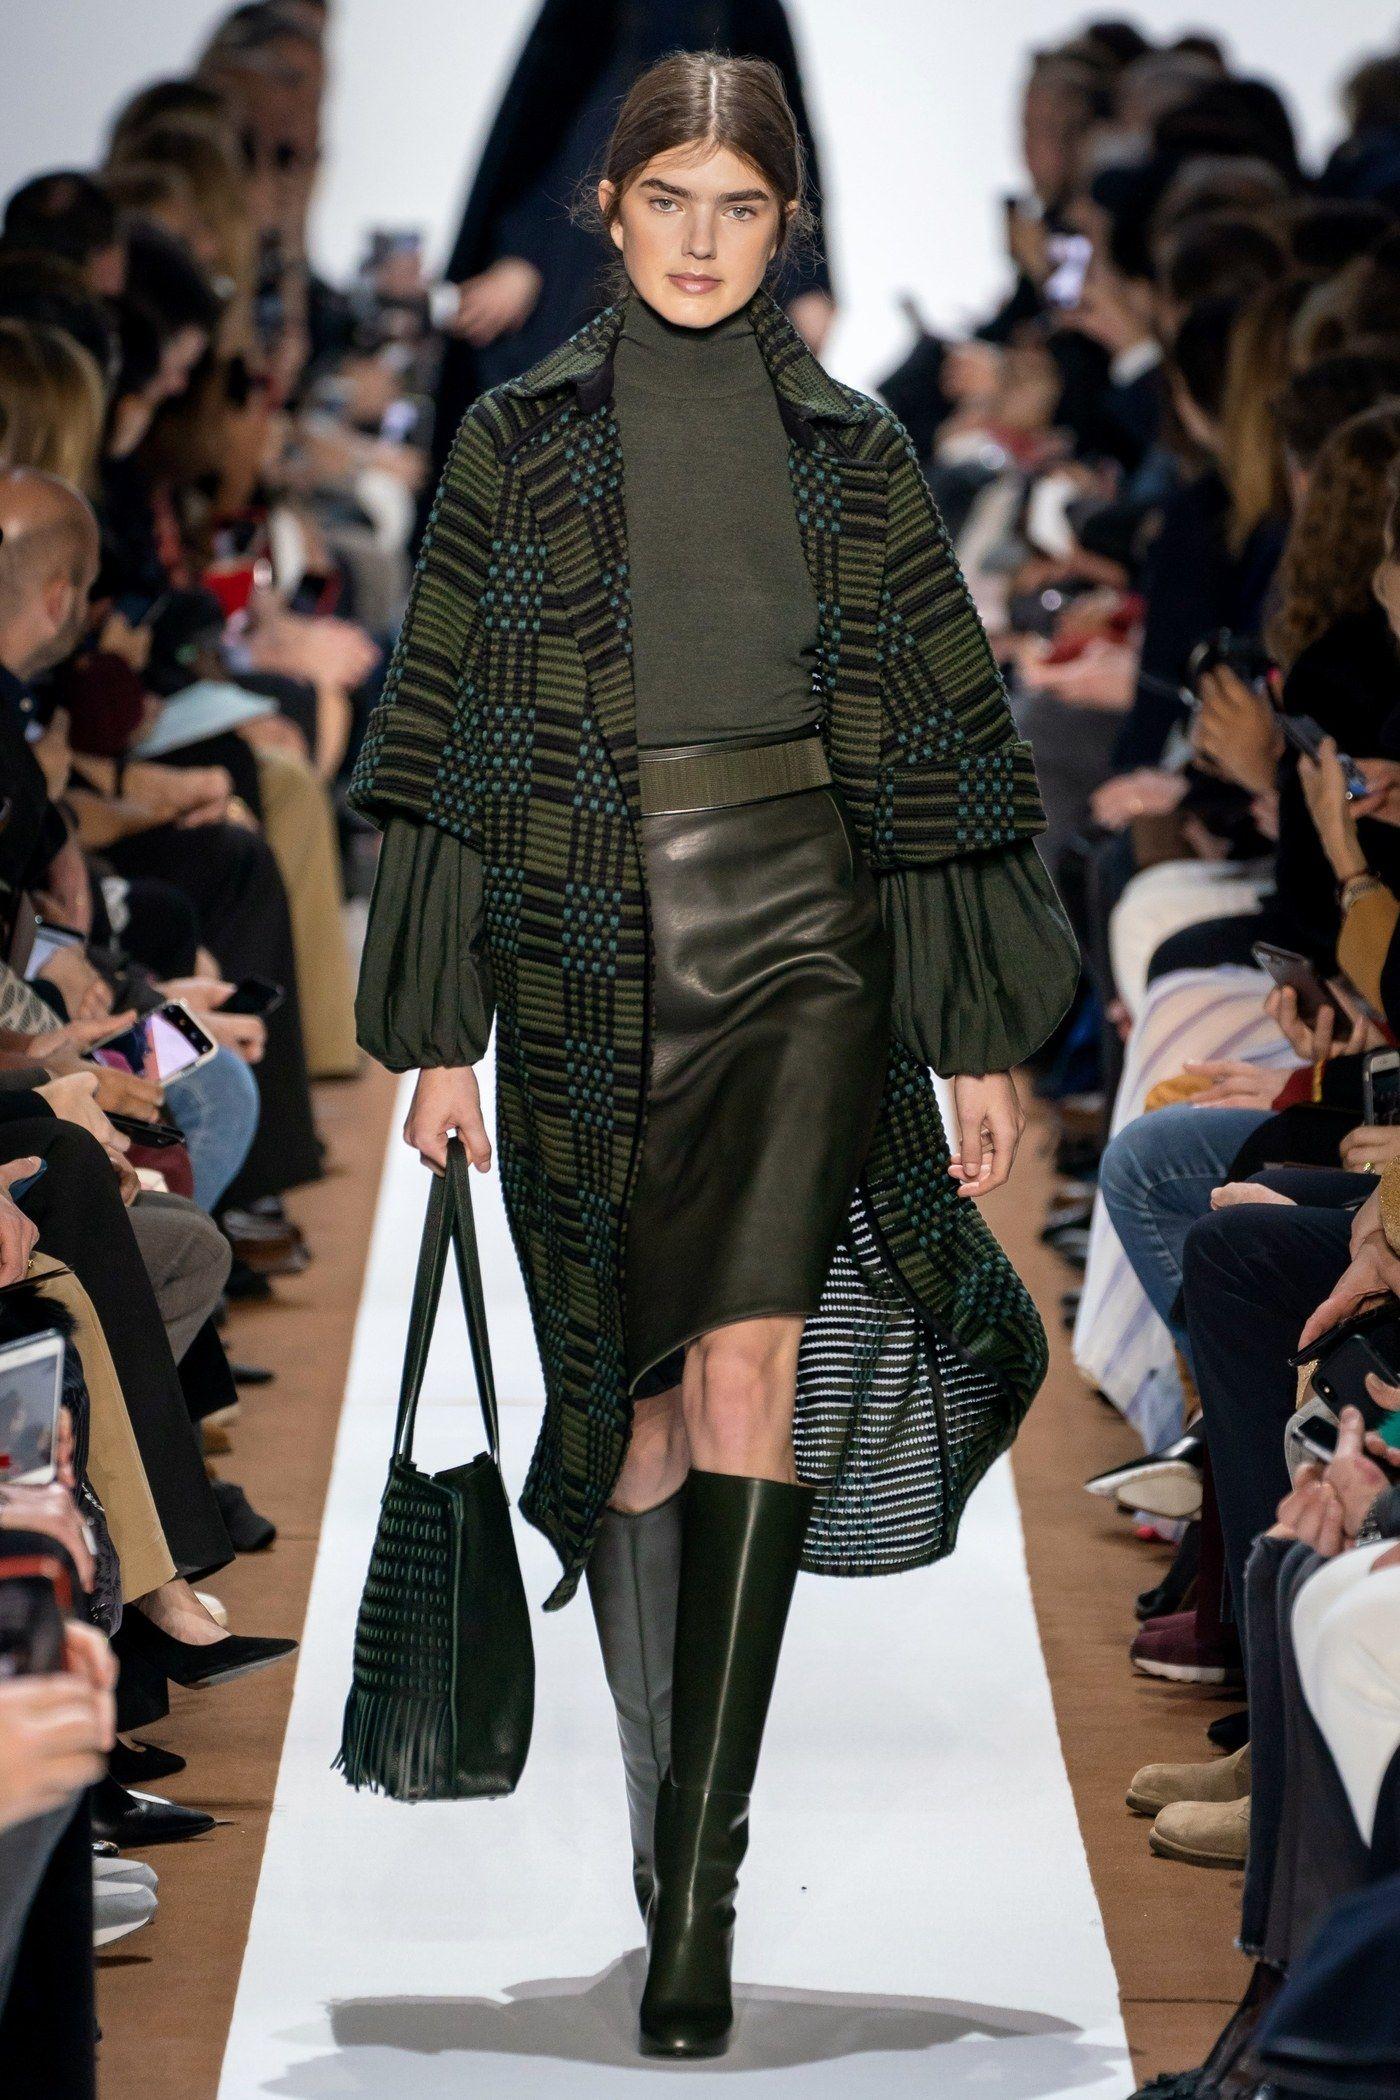 Prêt-à-porter Akris Herbst / Inverno 2019-2020 – Sfilate di moda | Vogue Germania